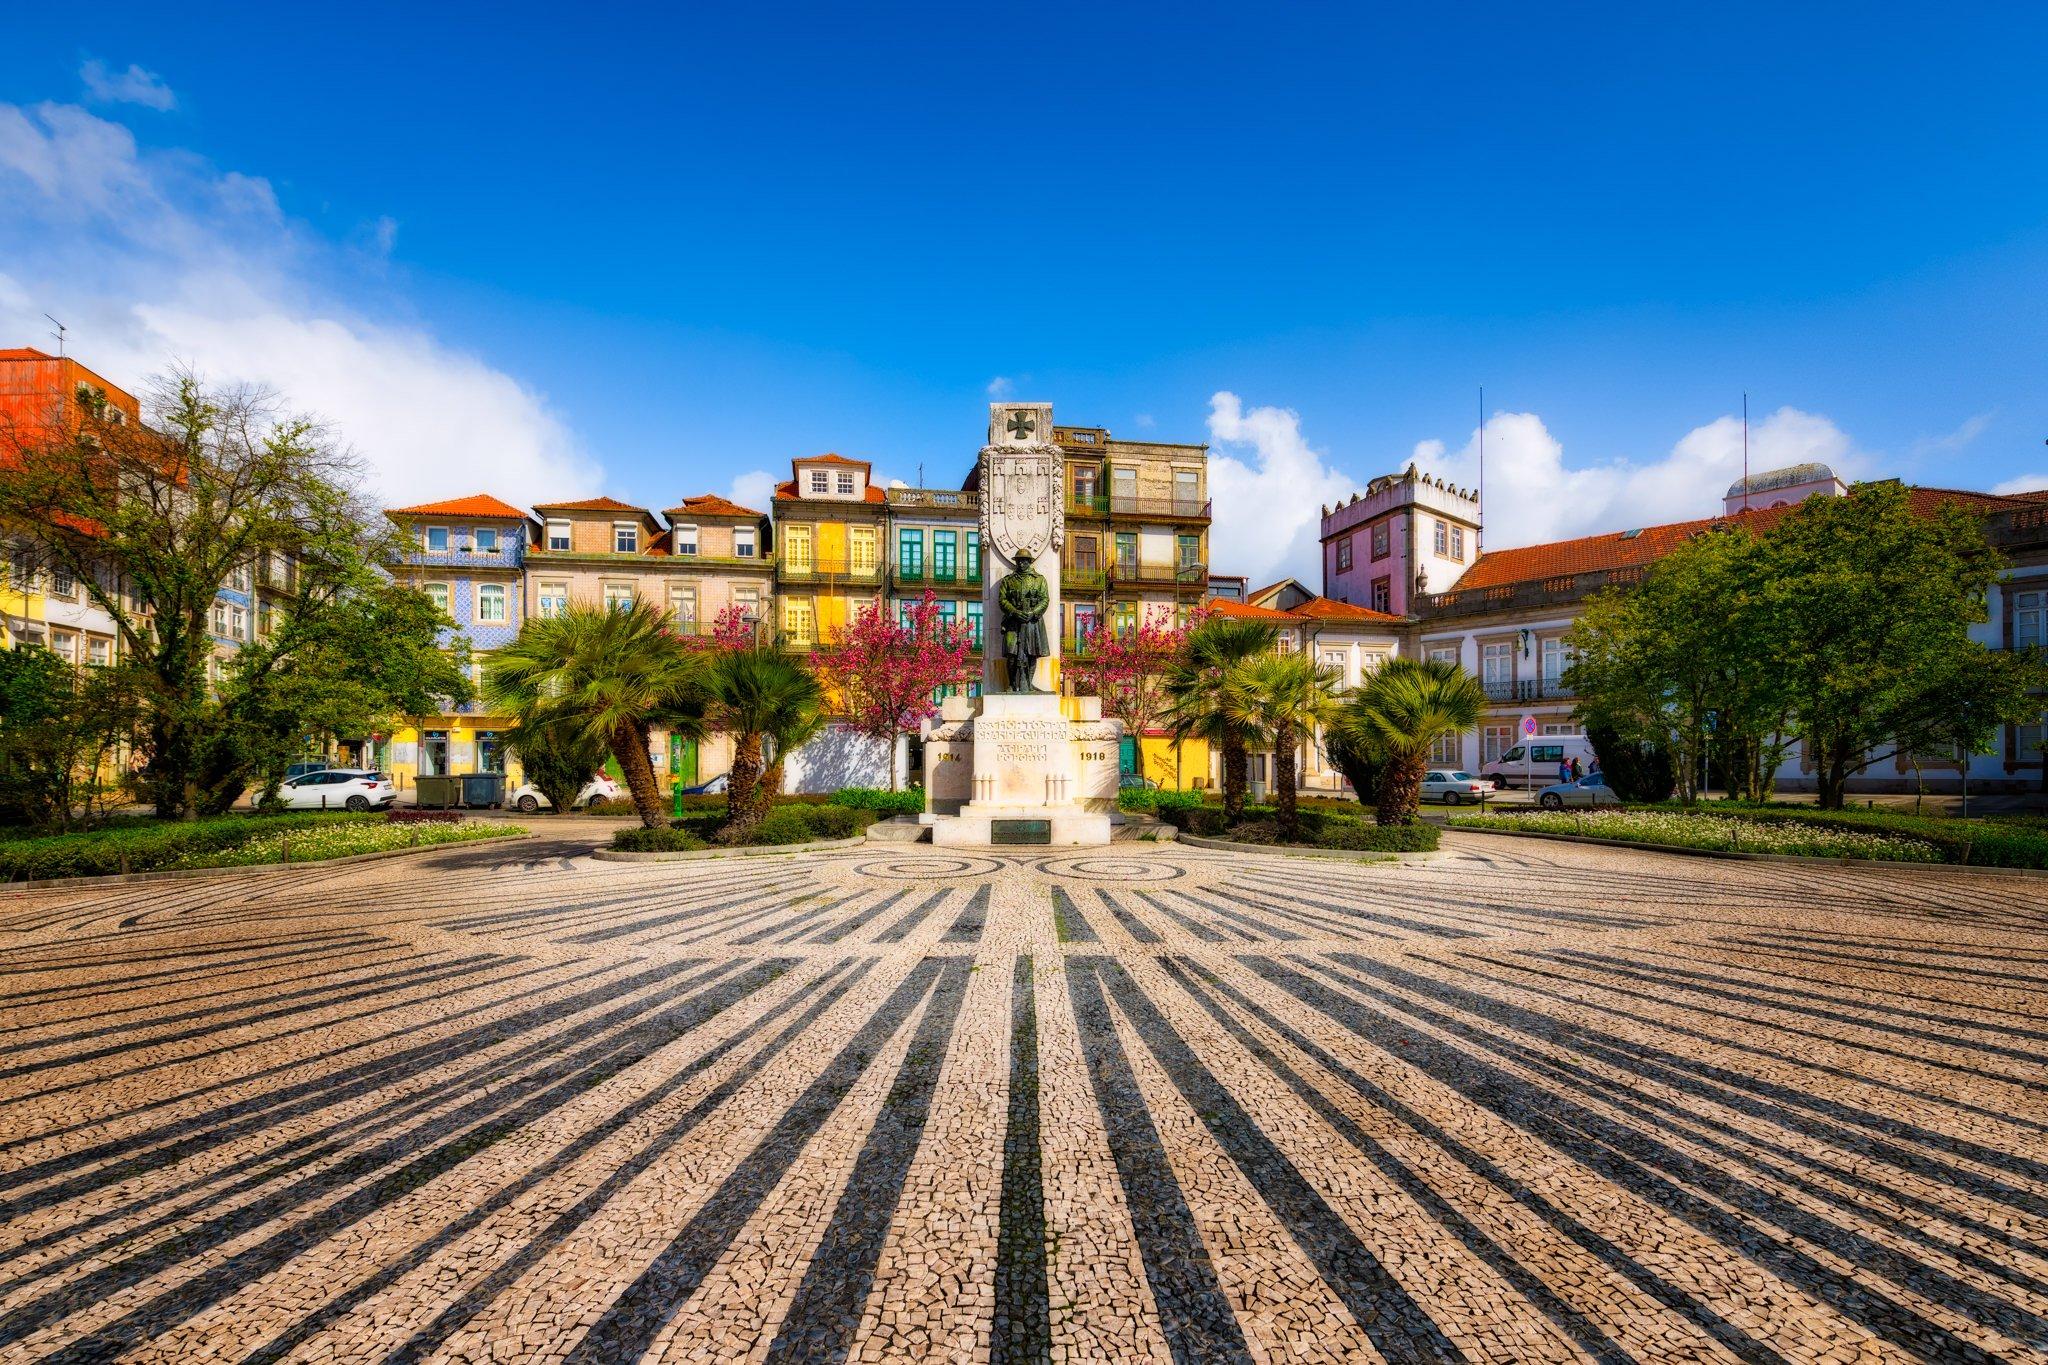 Porto Praça de Carlos Alberto on a sunny day, Portugal.